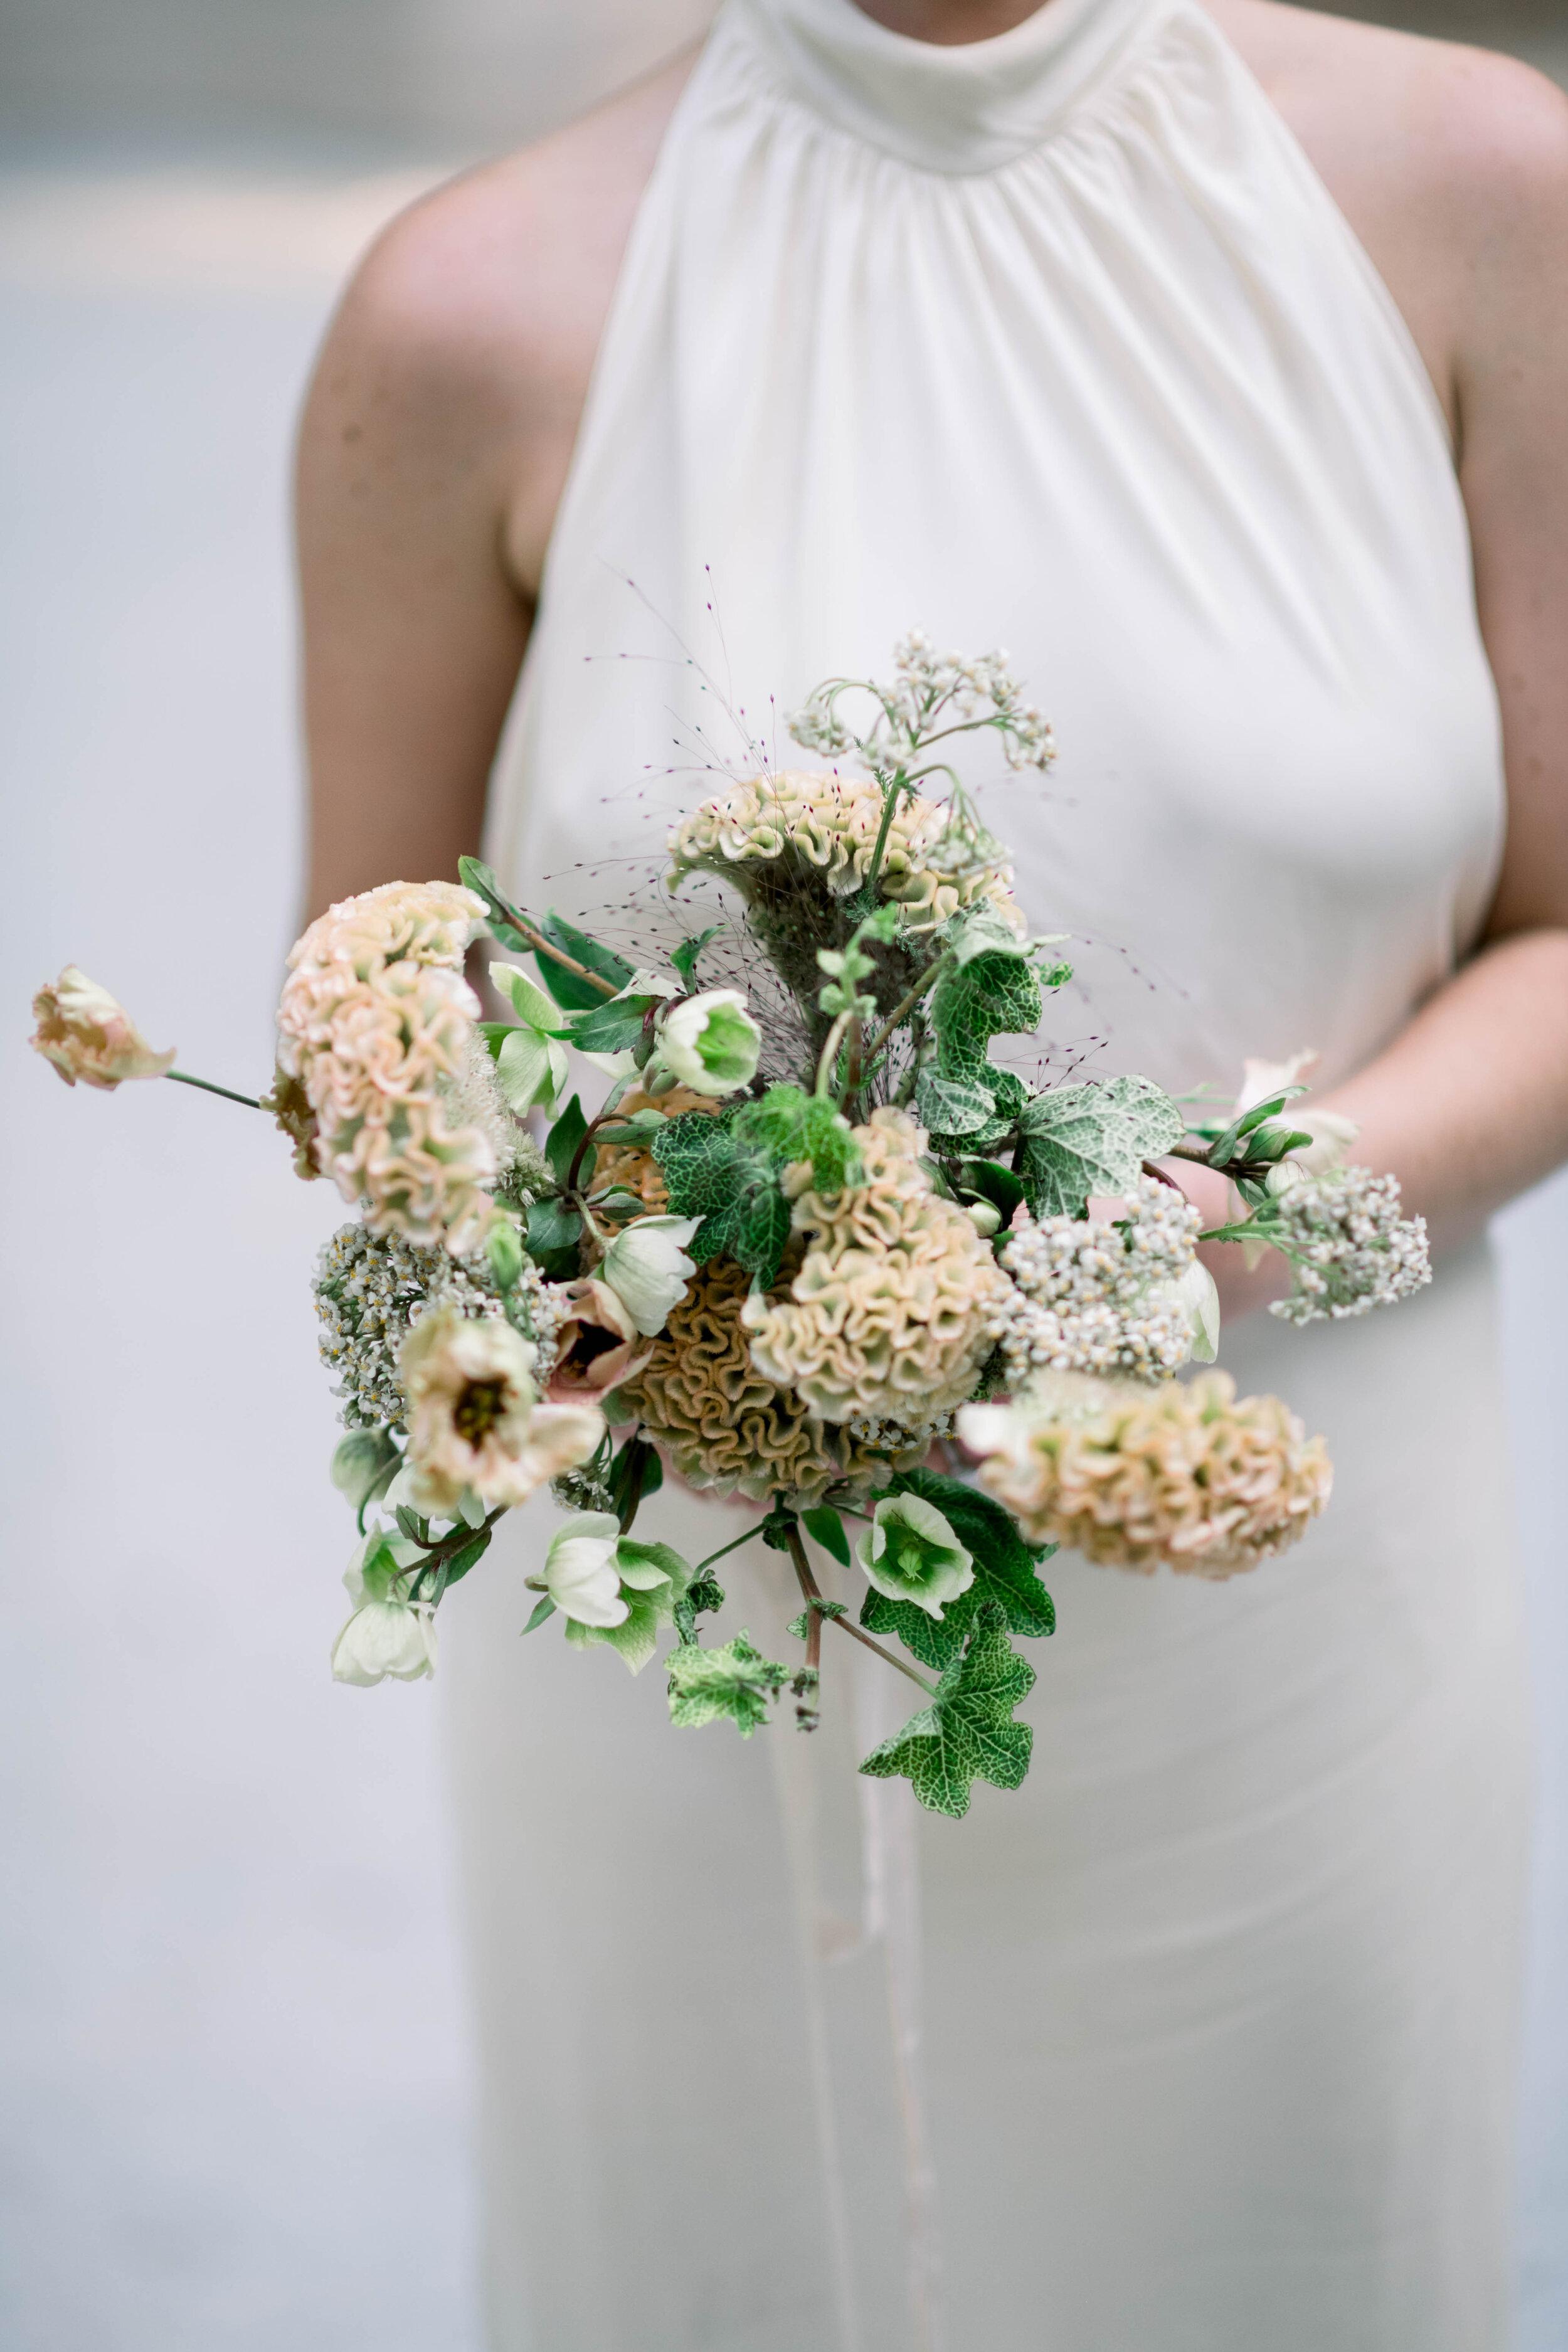 fine art wedding, Atlanta wedding, swan house wedding, modern wedding, rolls Royce wedding, swan house, high neck wedding dress, white tux, bridal bouquet, wedding bouquet